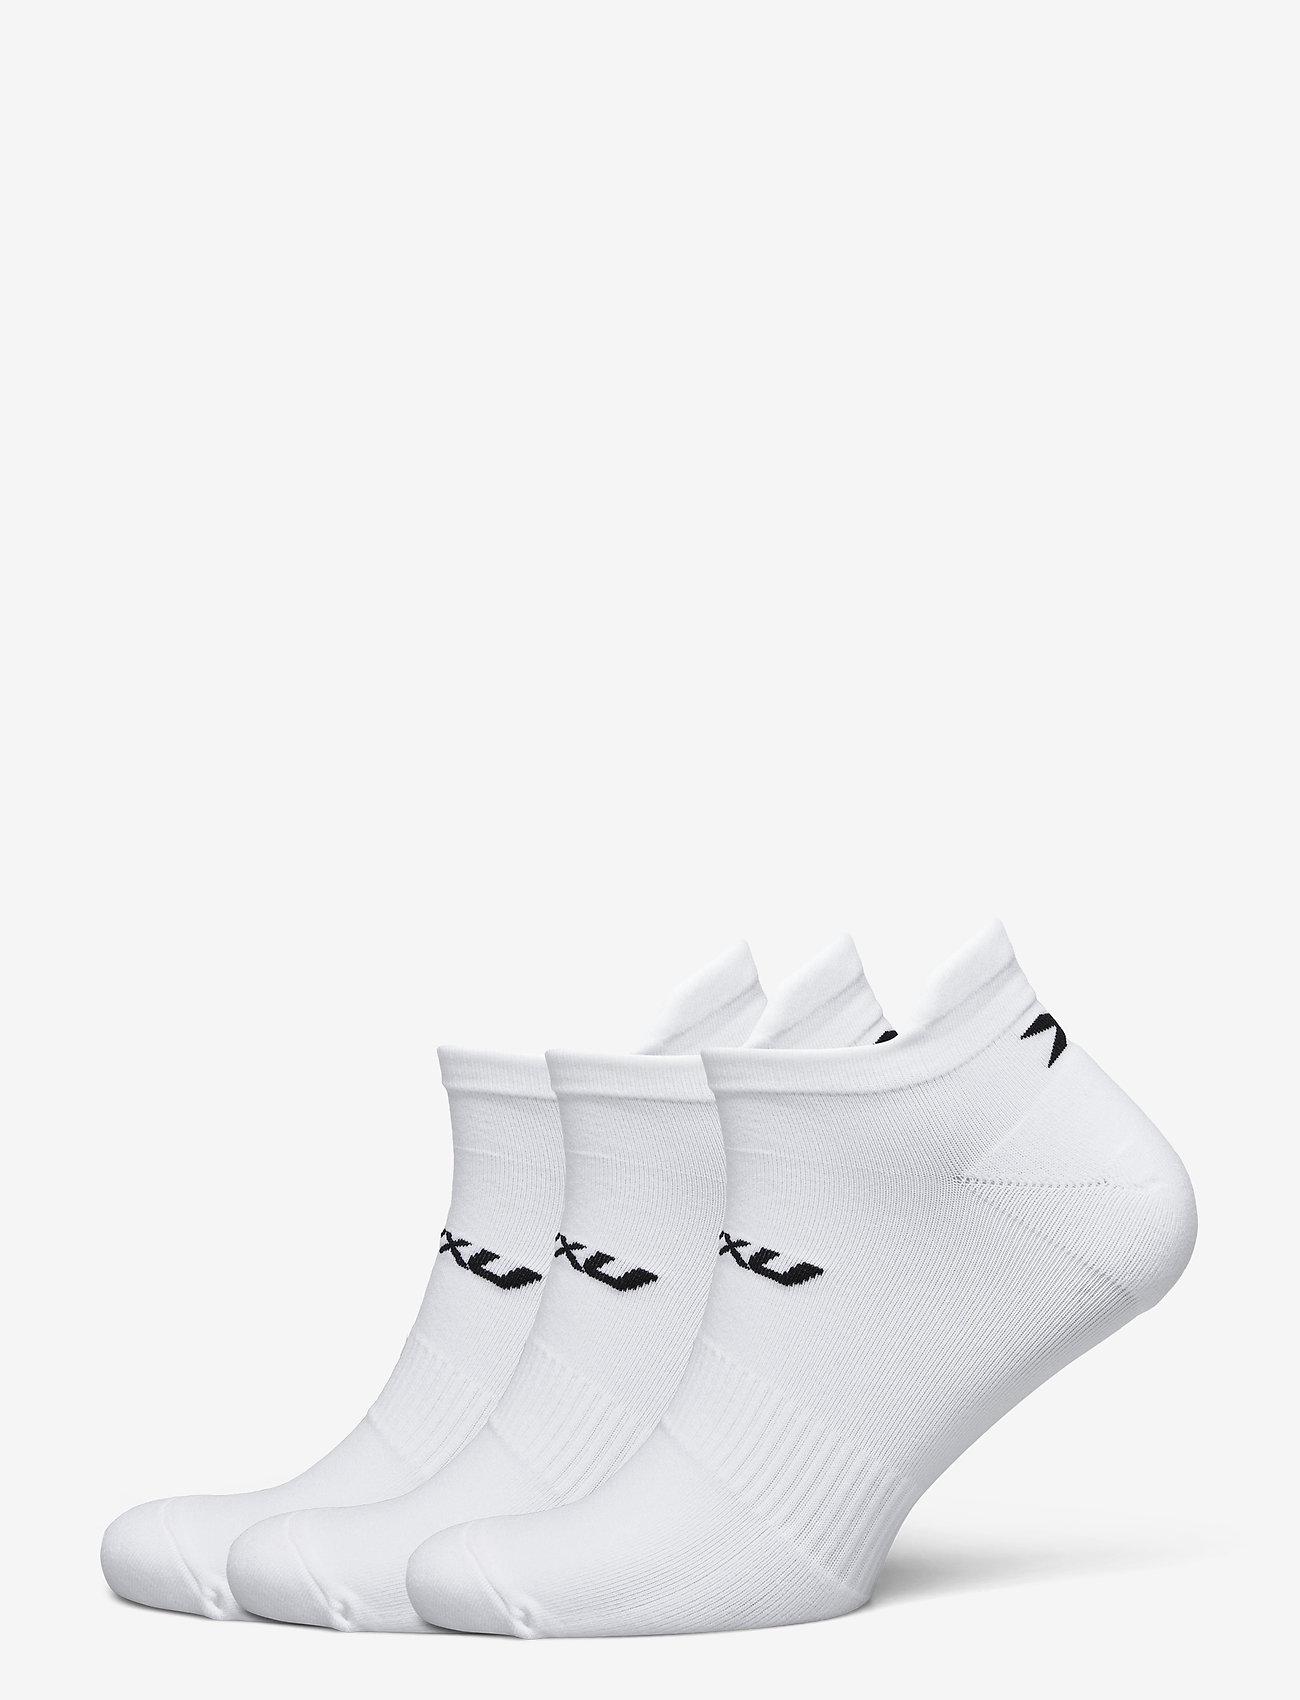 2XU - ANKLE SOCKS 3 PACK - ankelstrumpor - white/black - 0